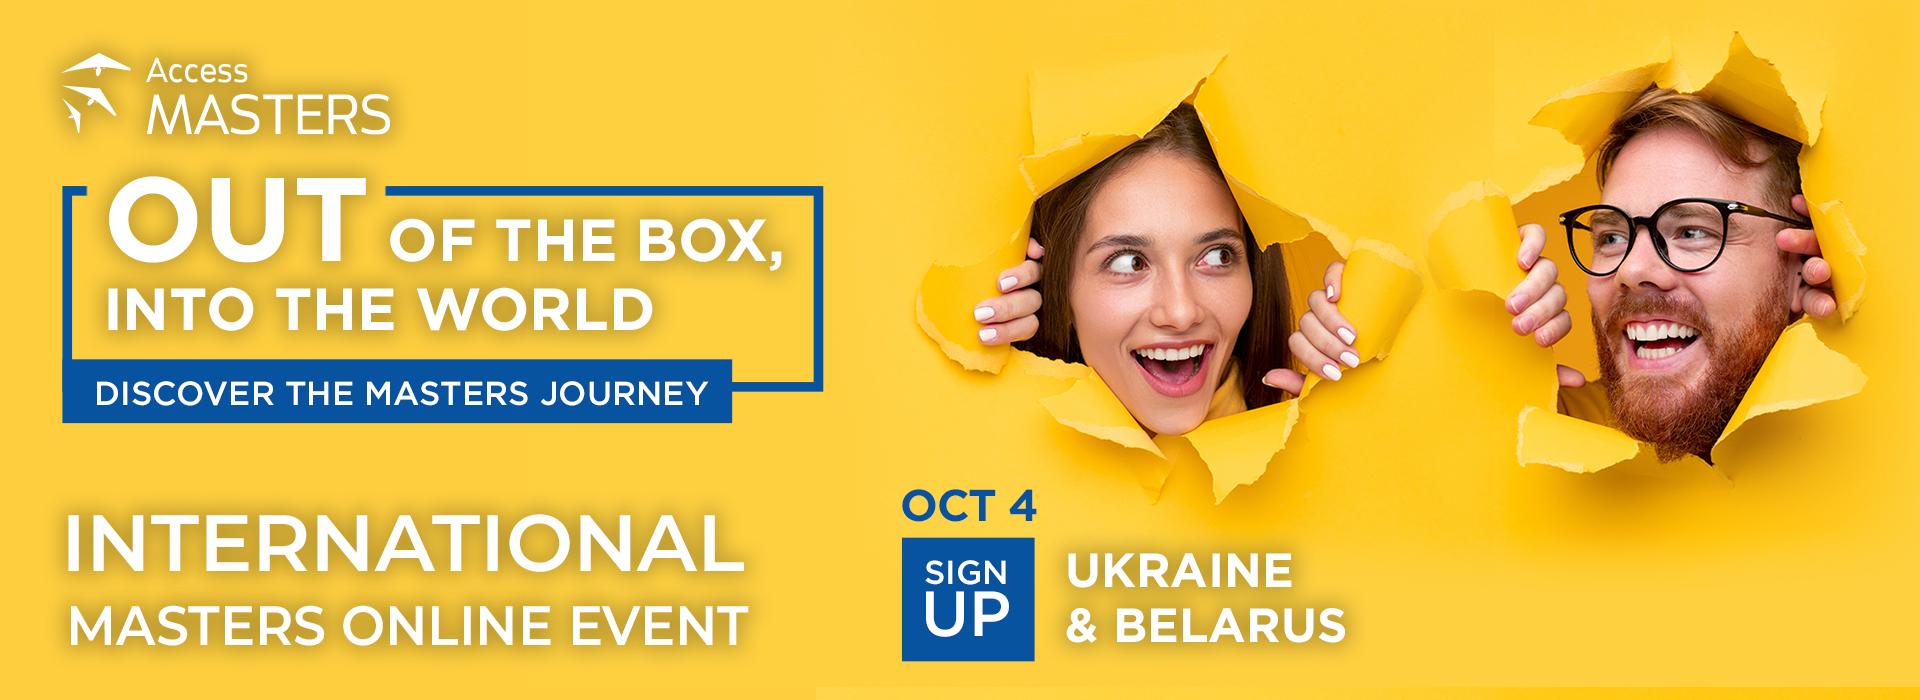 Access Masters Online Event in Ukraine and Belarus